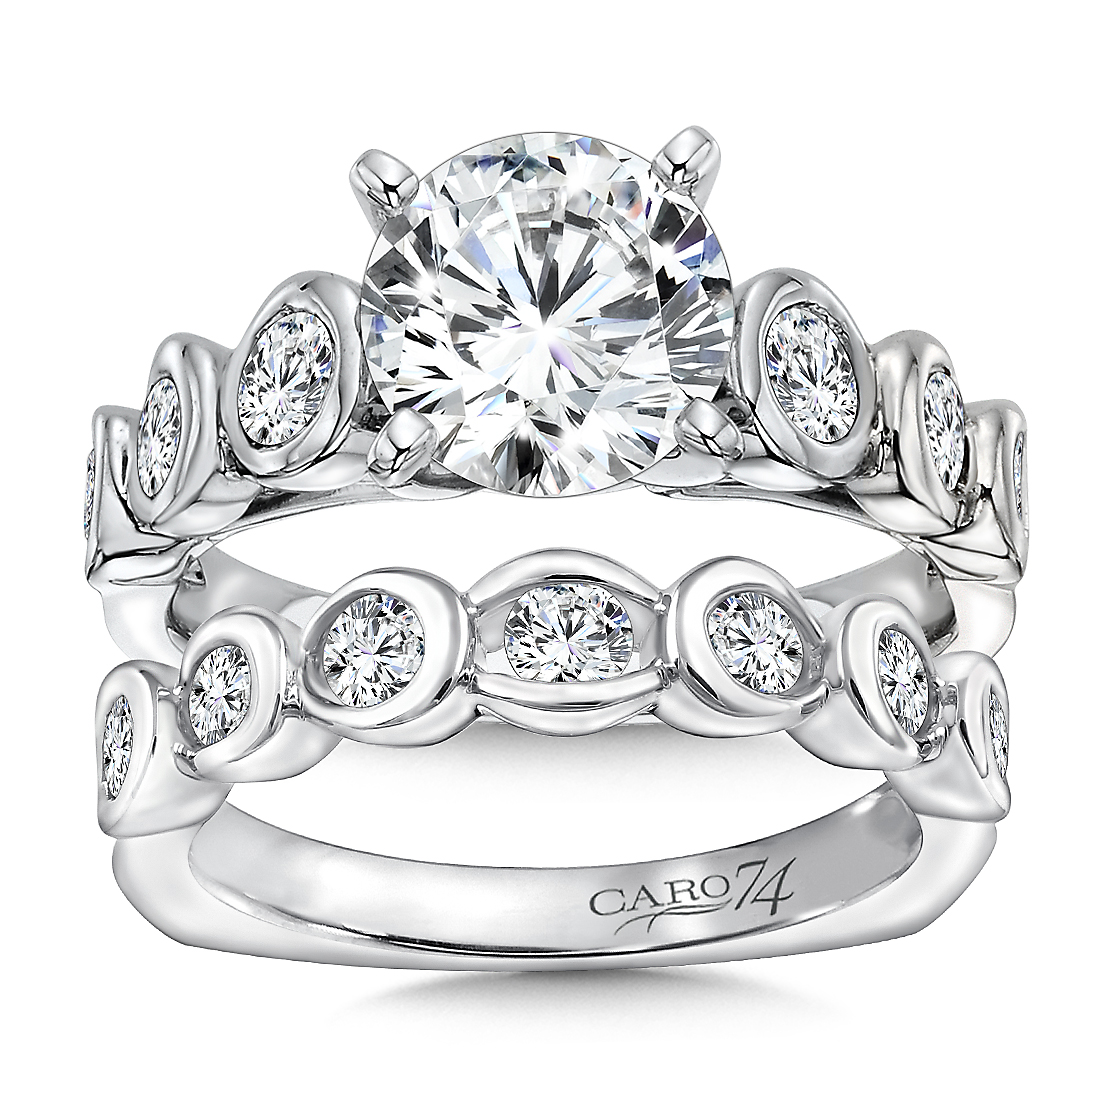 Custom Engagement Rings Dallas TX Wholesale, Shira Diamonds